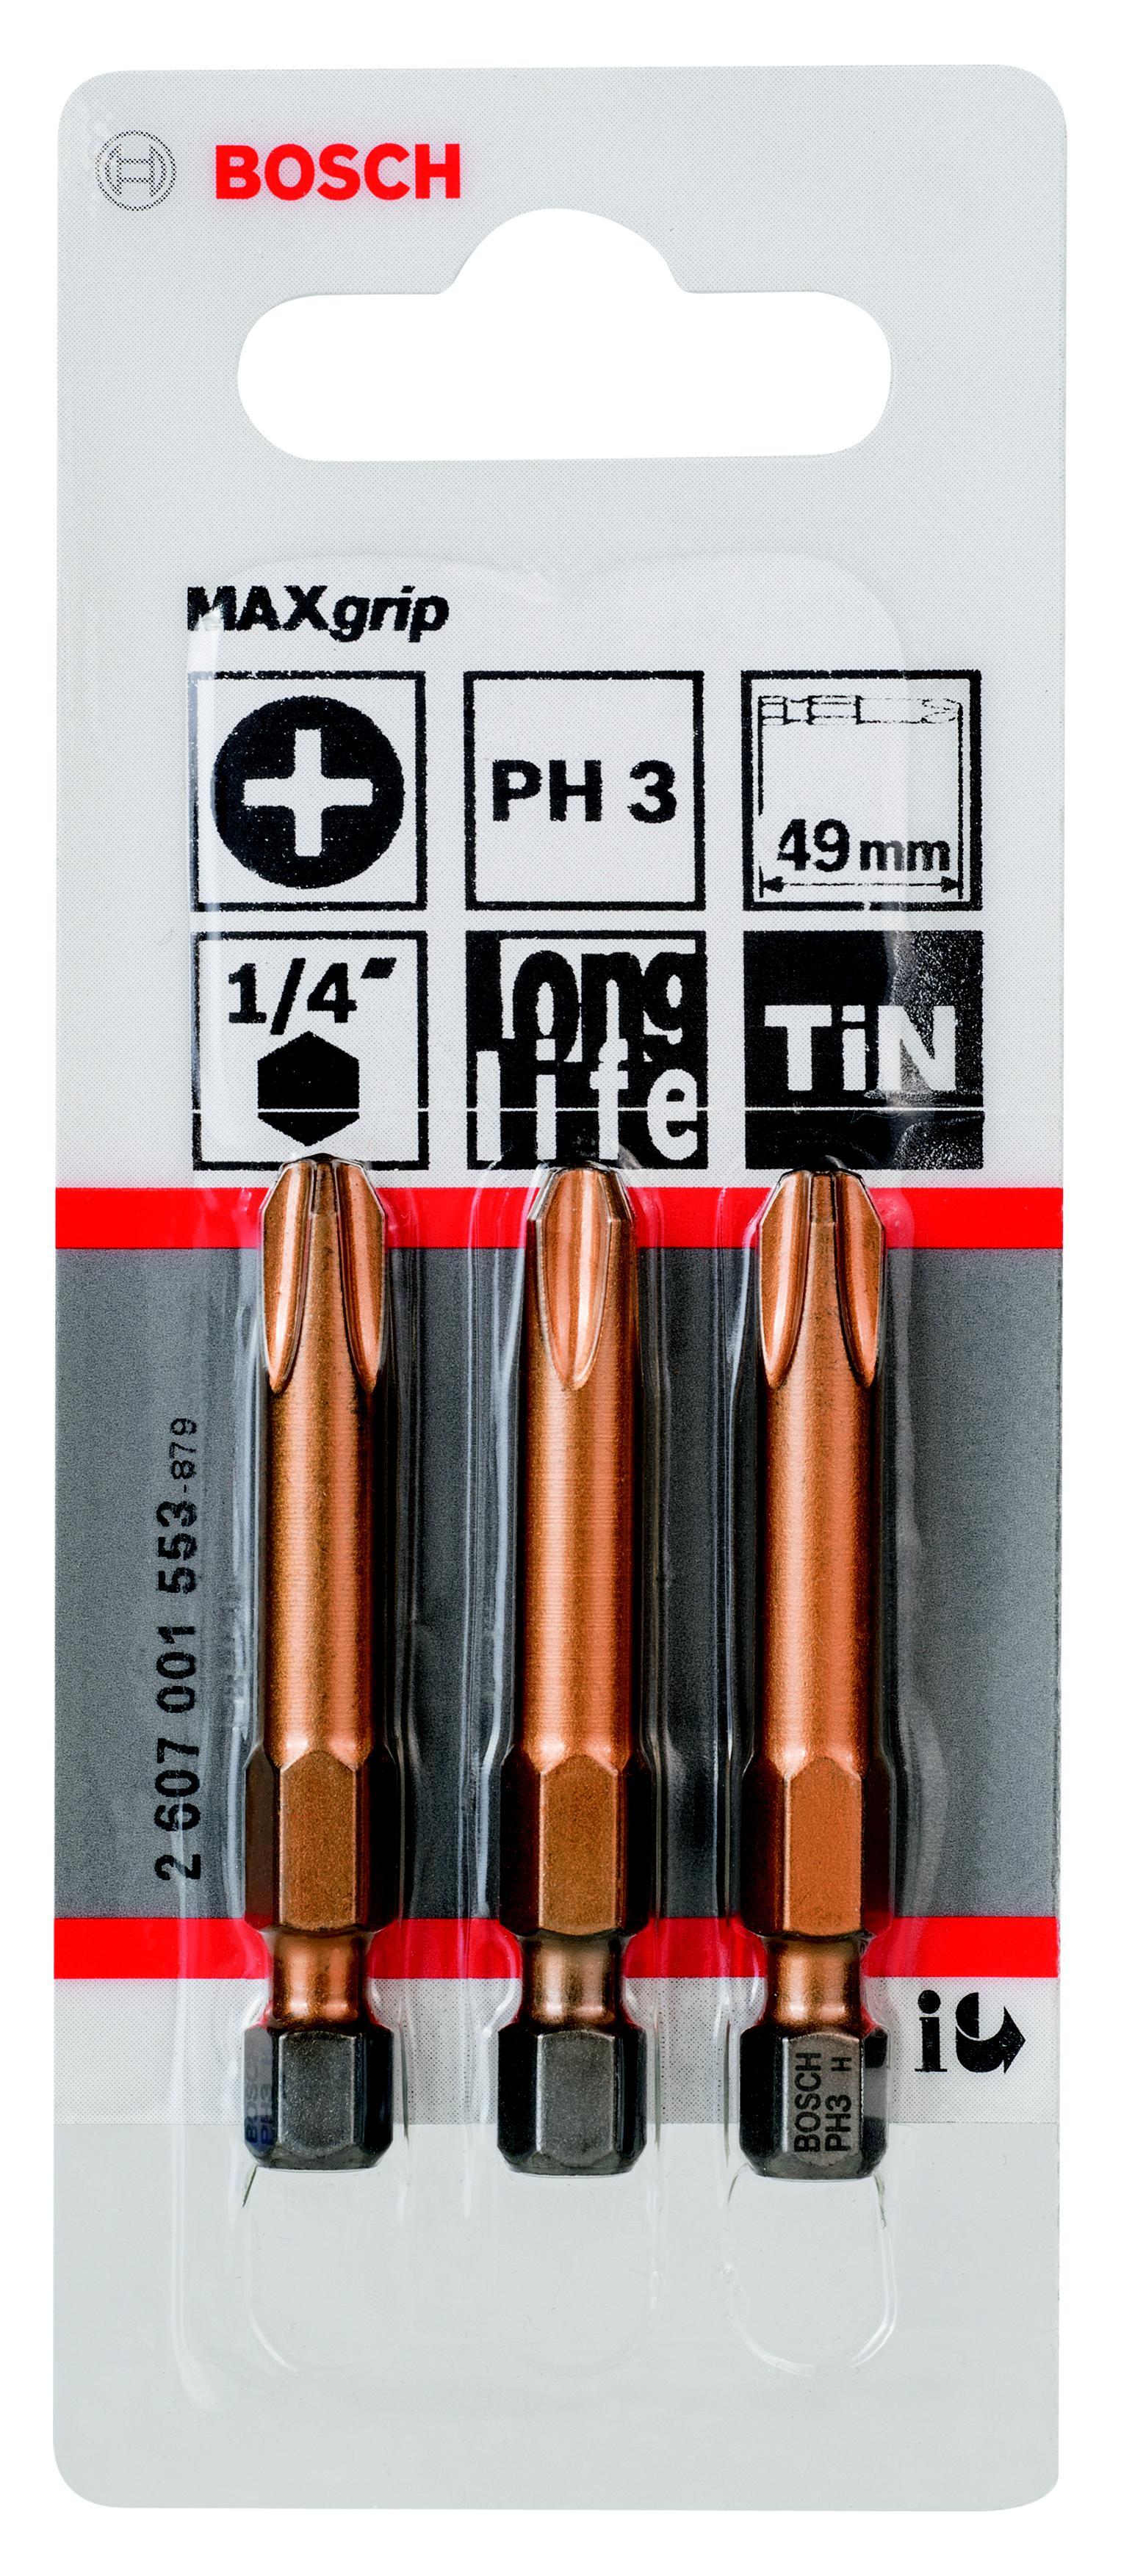 Бита Bosch Maxgrip ph3 49 мм, 3 шт. (2.607.001.553) бита рz1 49 мм 3 шт bosch профи